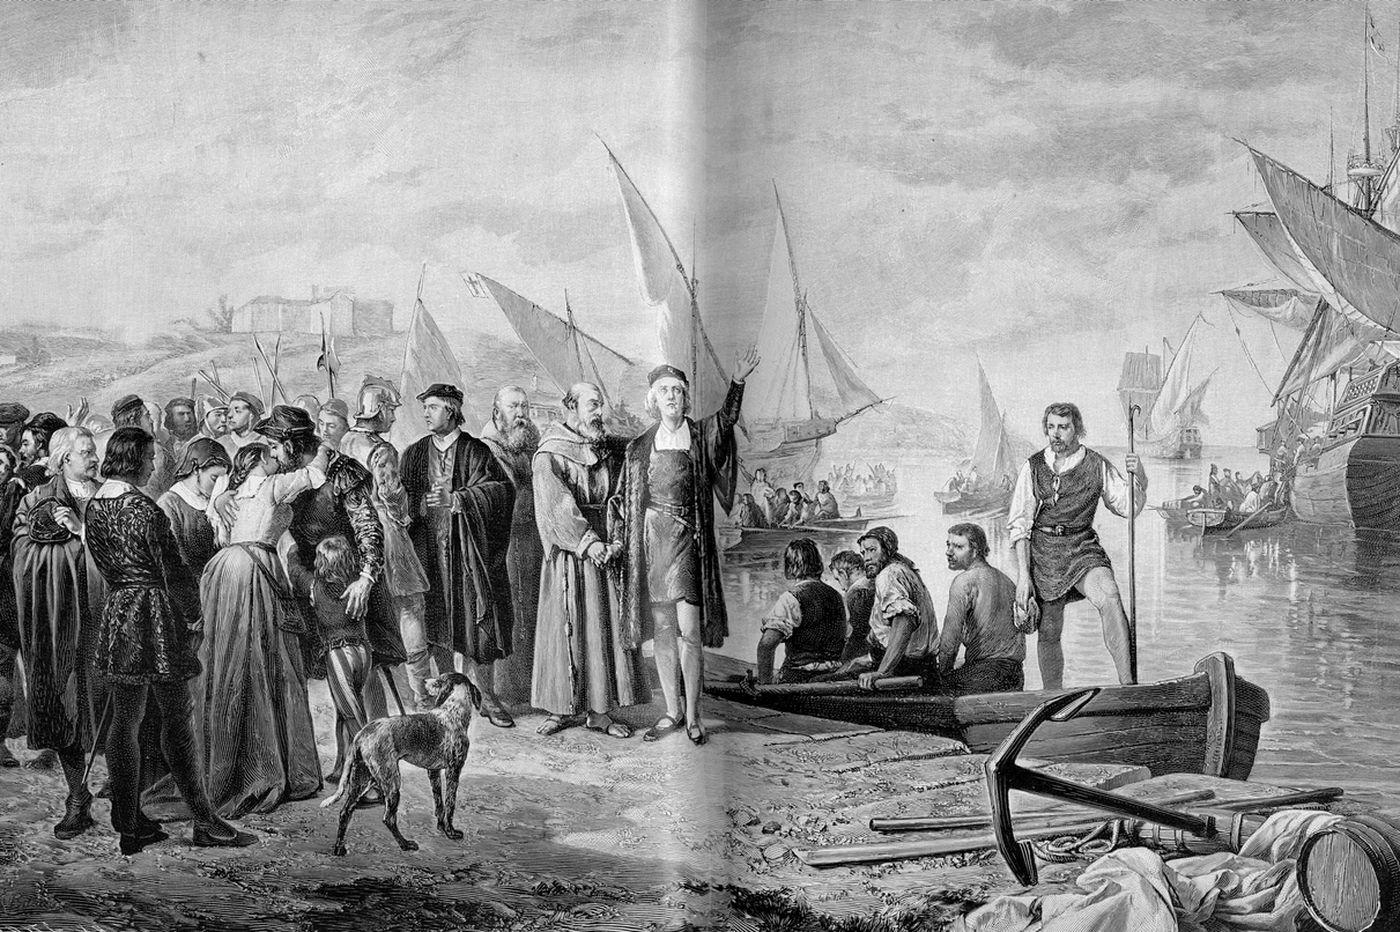 A caravan of migrants carrying smallpox? We've seen that before